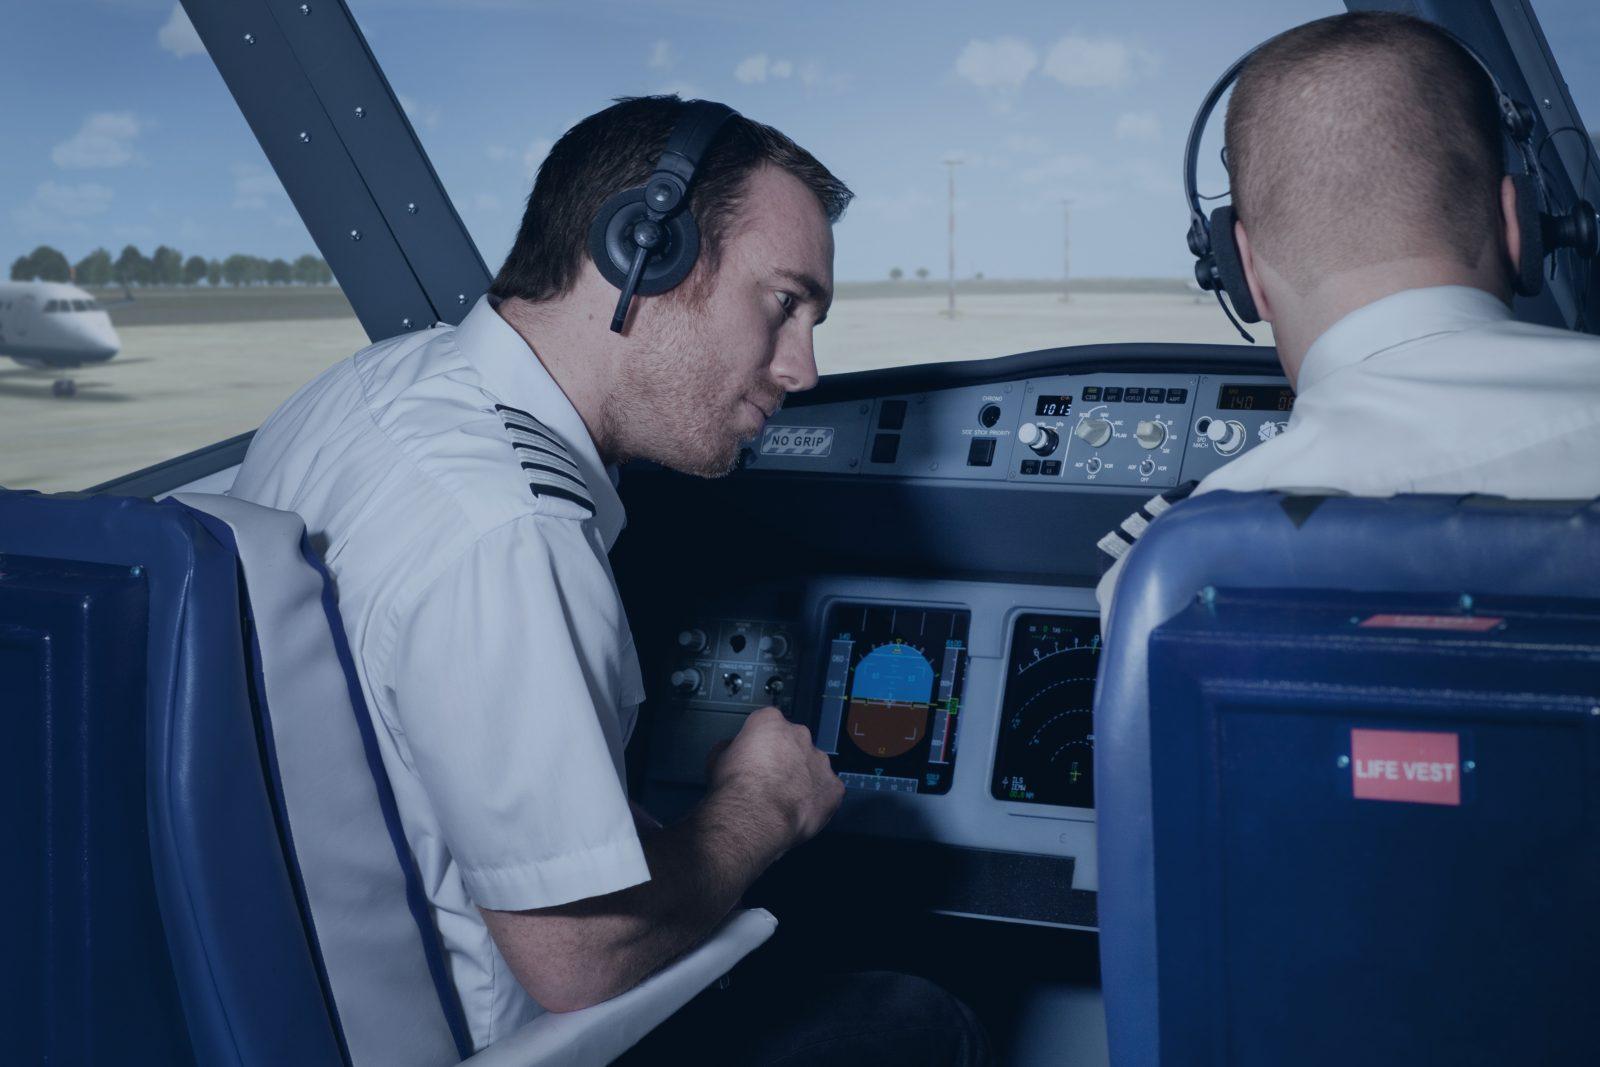 Airline simulator preparation